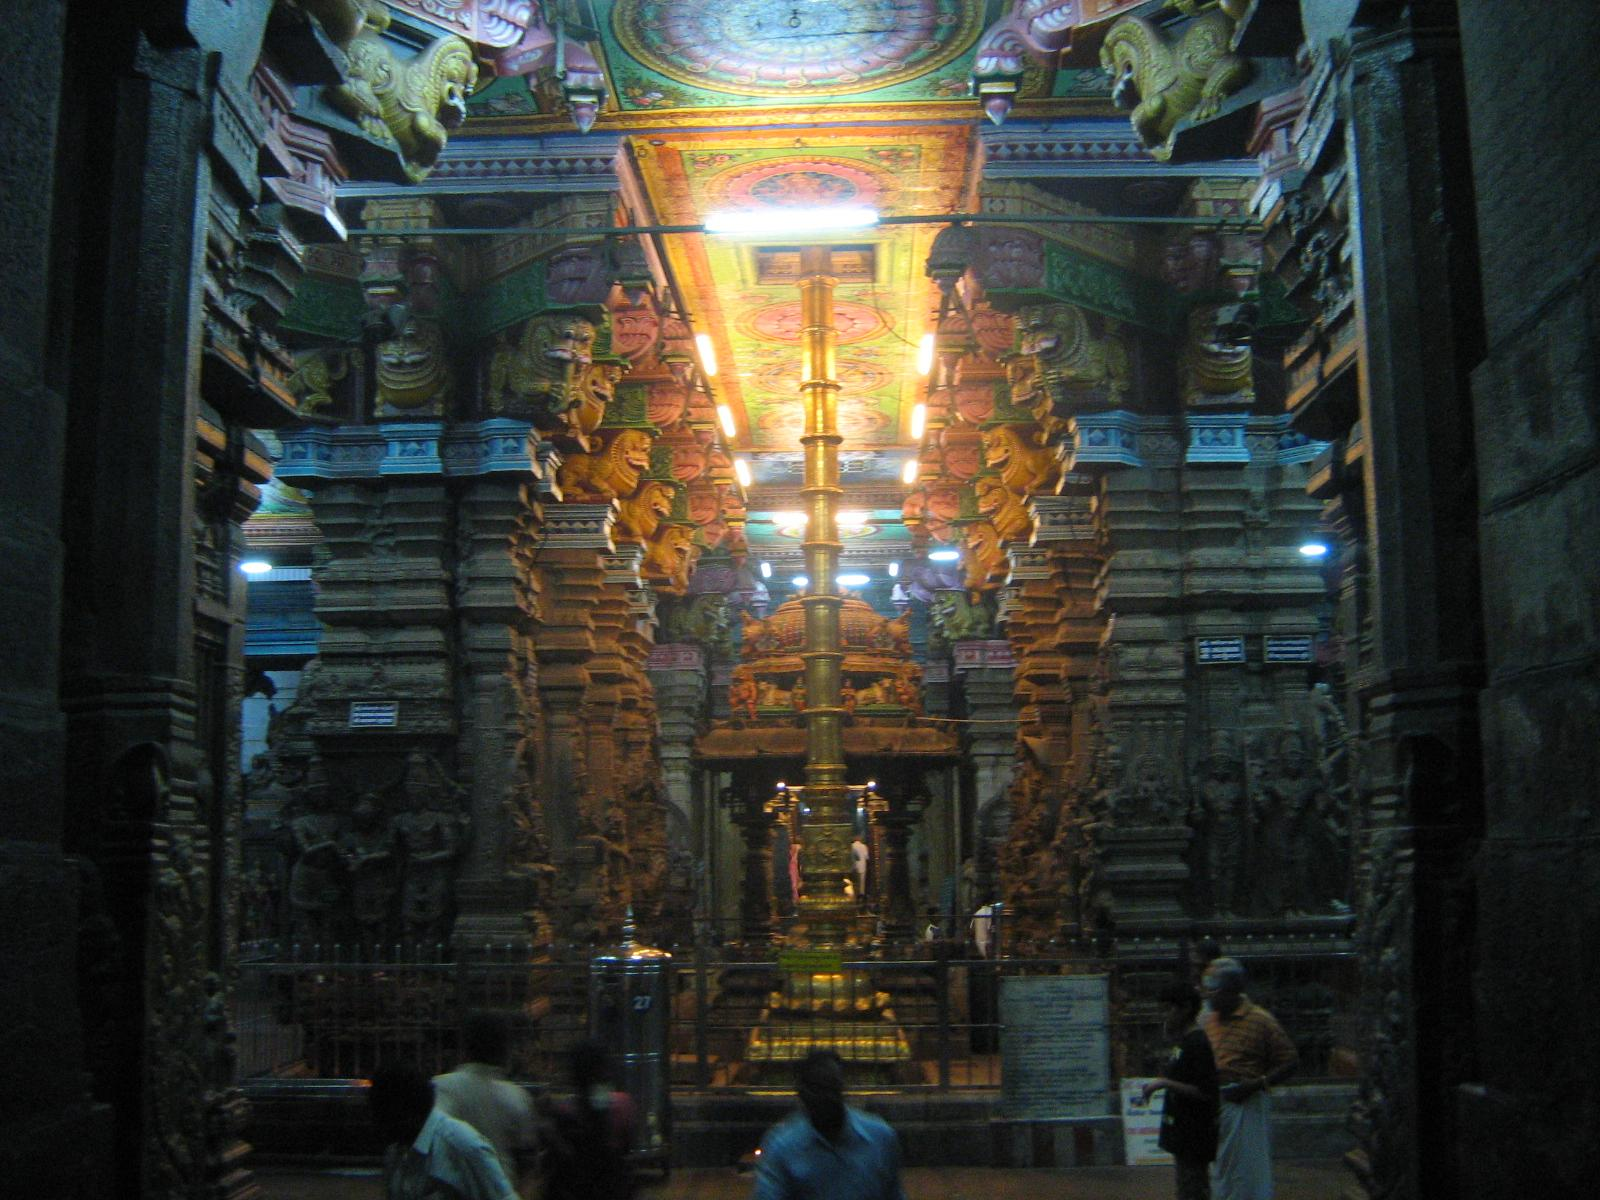 Amit in Lighter Vein: Driving to Kanyakumari - the longest ...